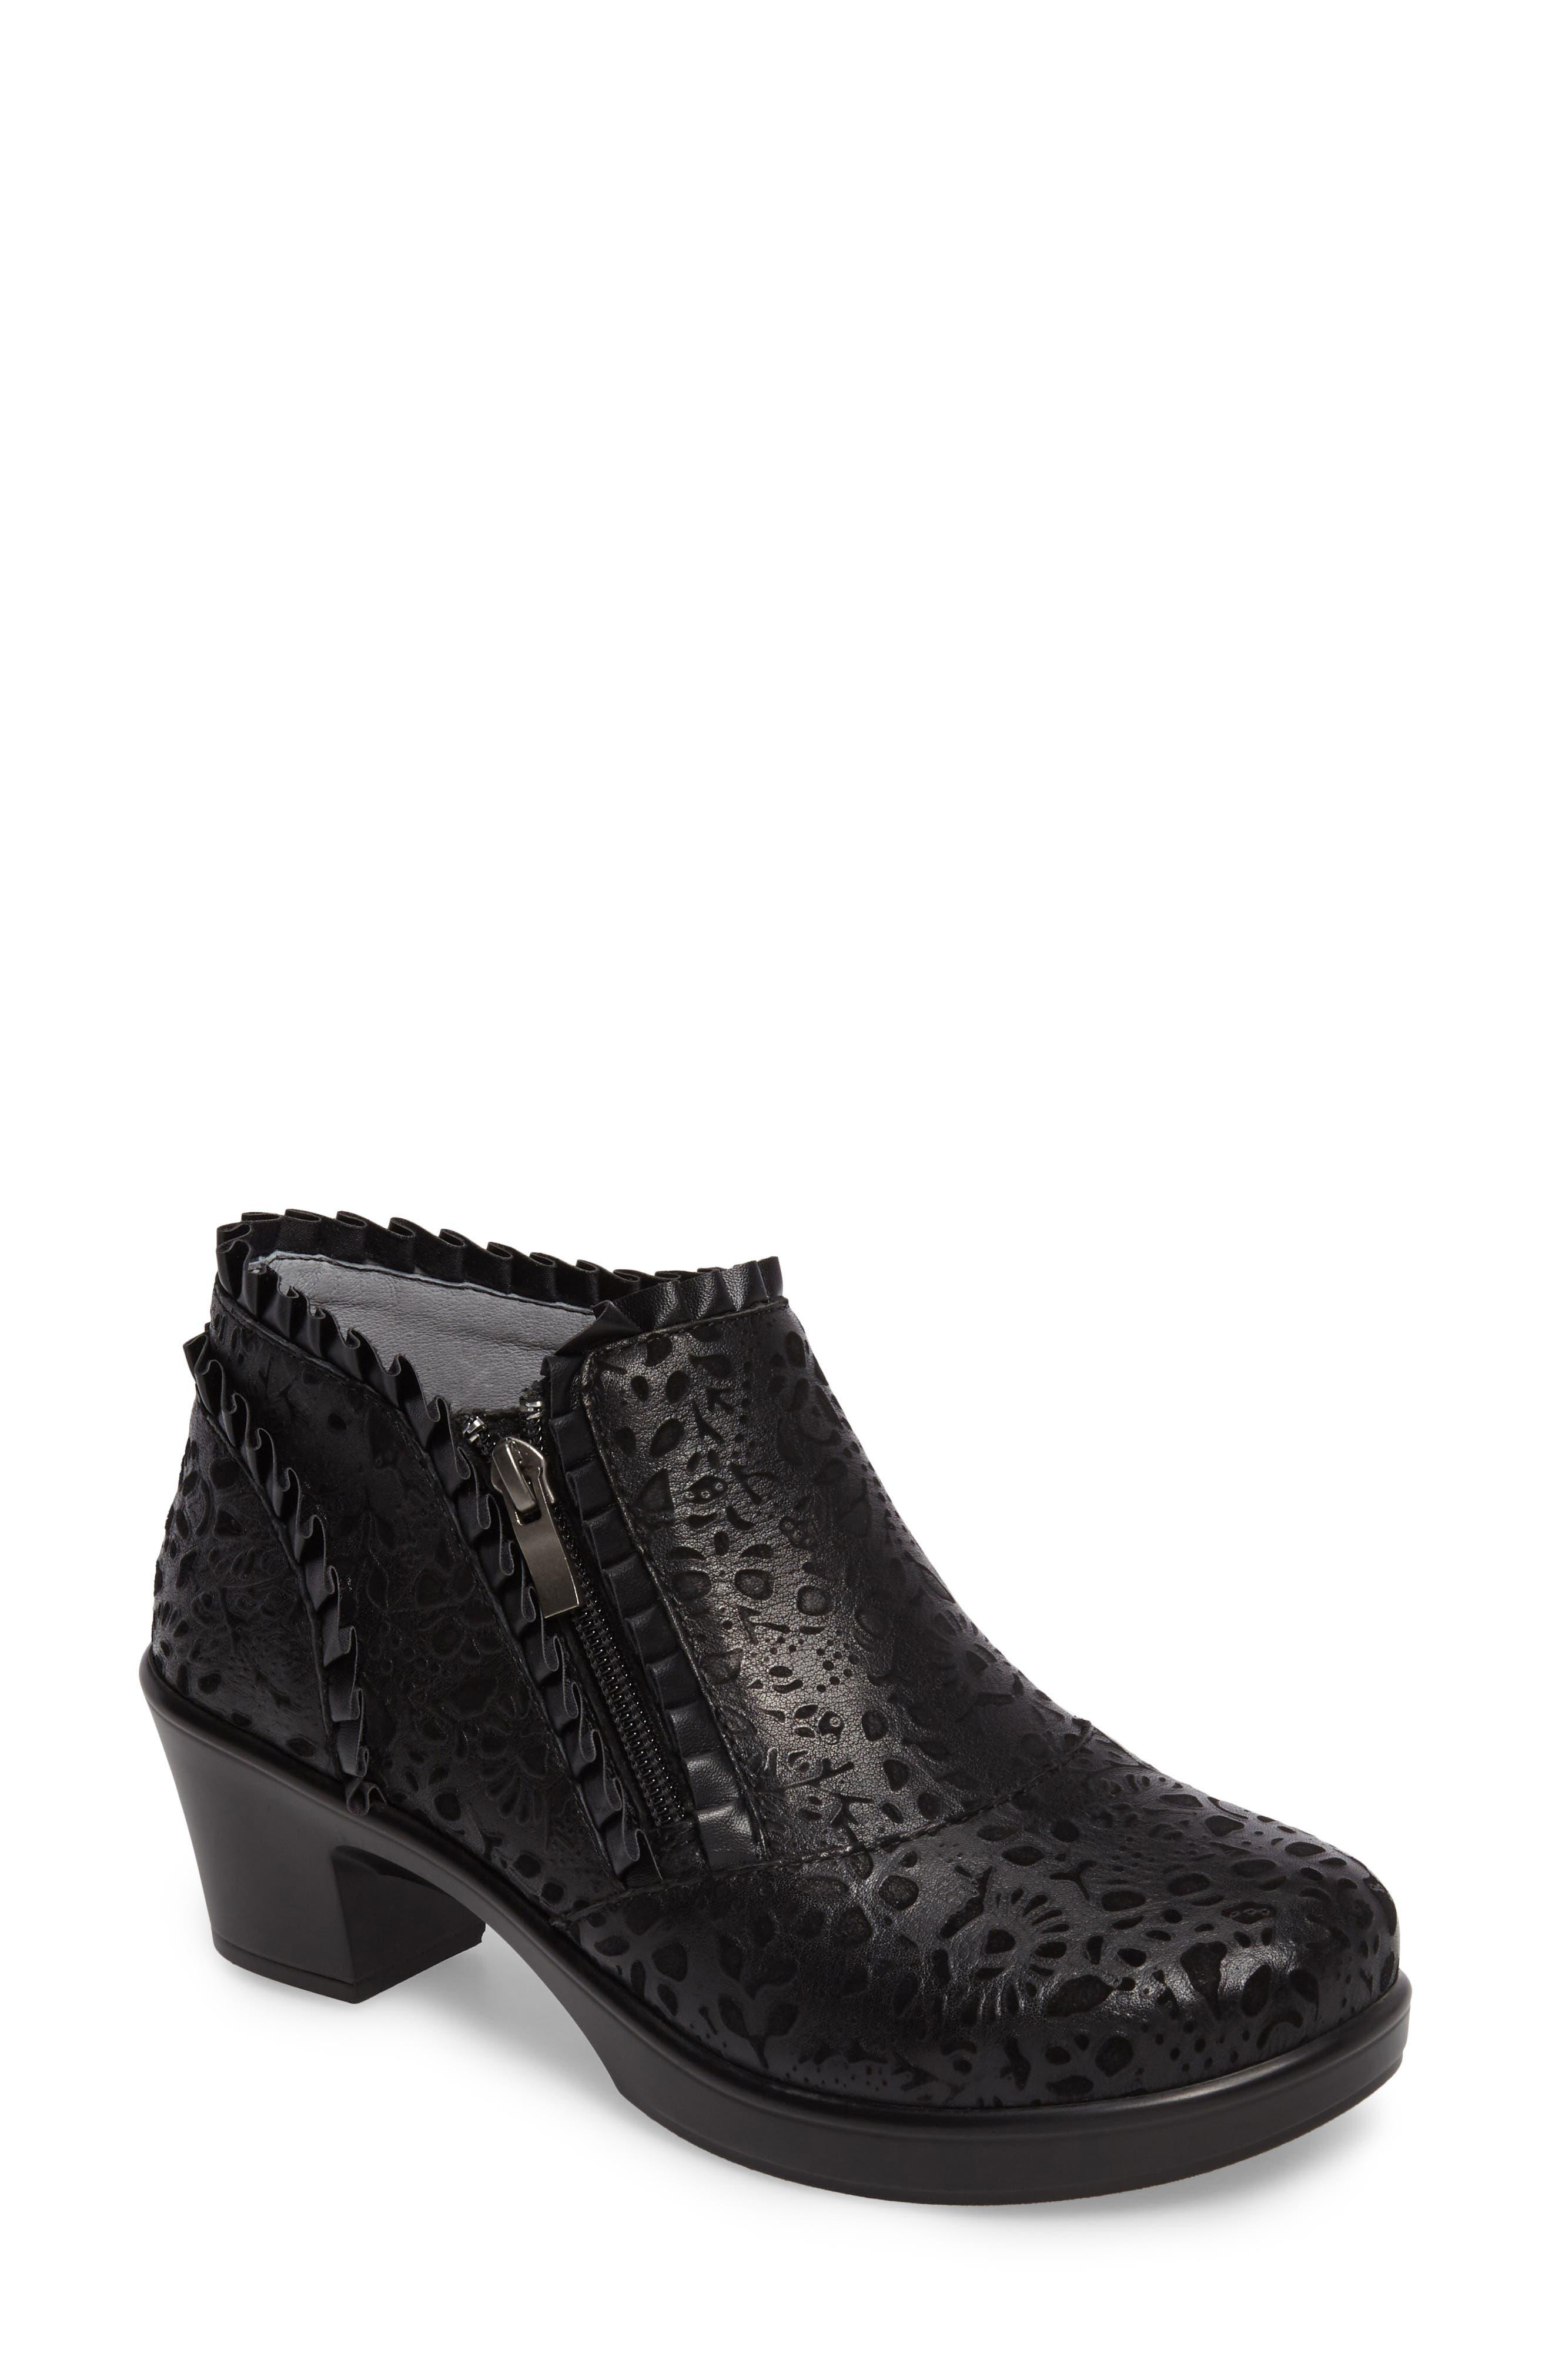 'Hannah' Saddle Boot,                             Main thumbnail 1, color,                             Delicut Leather